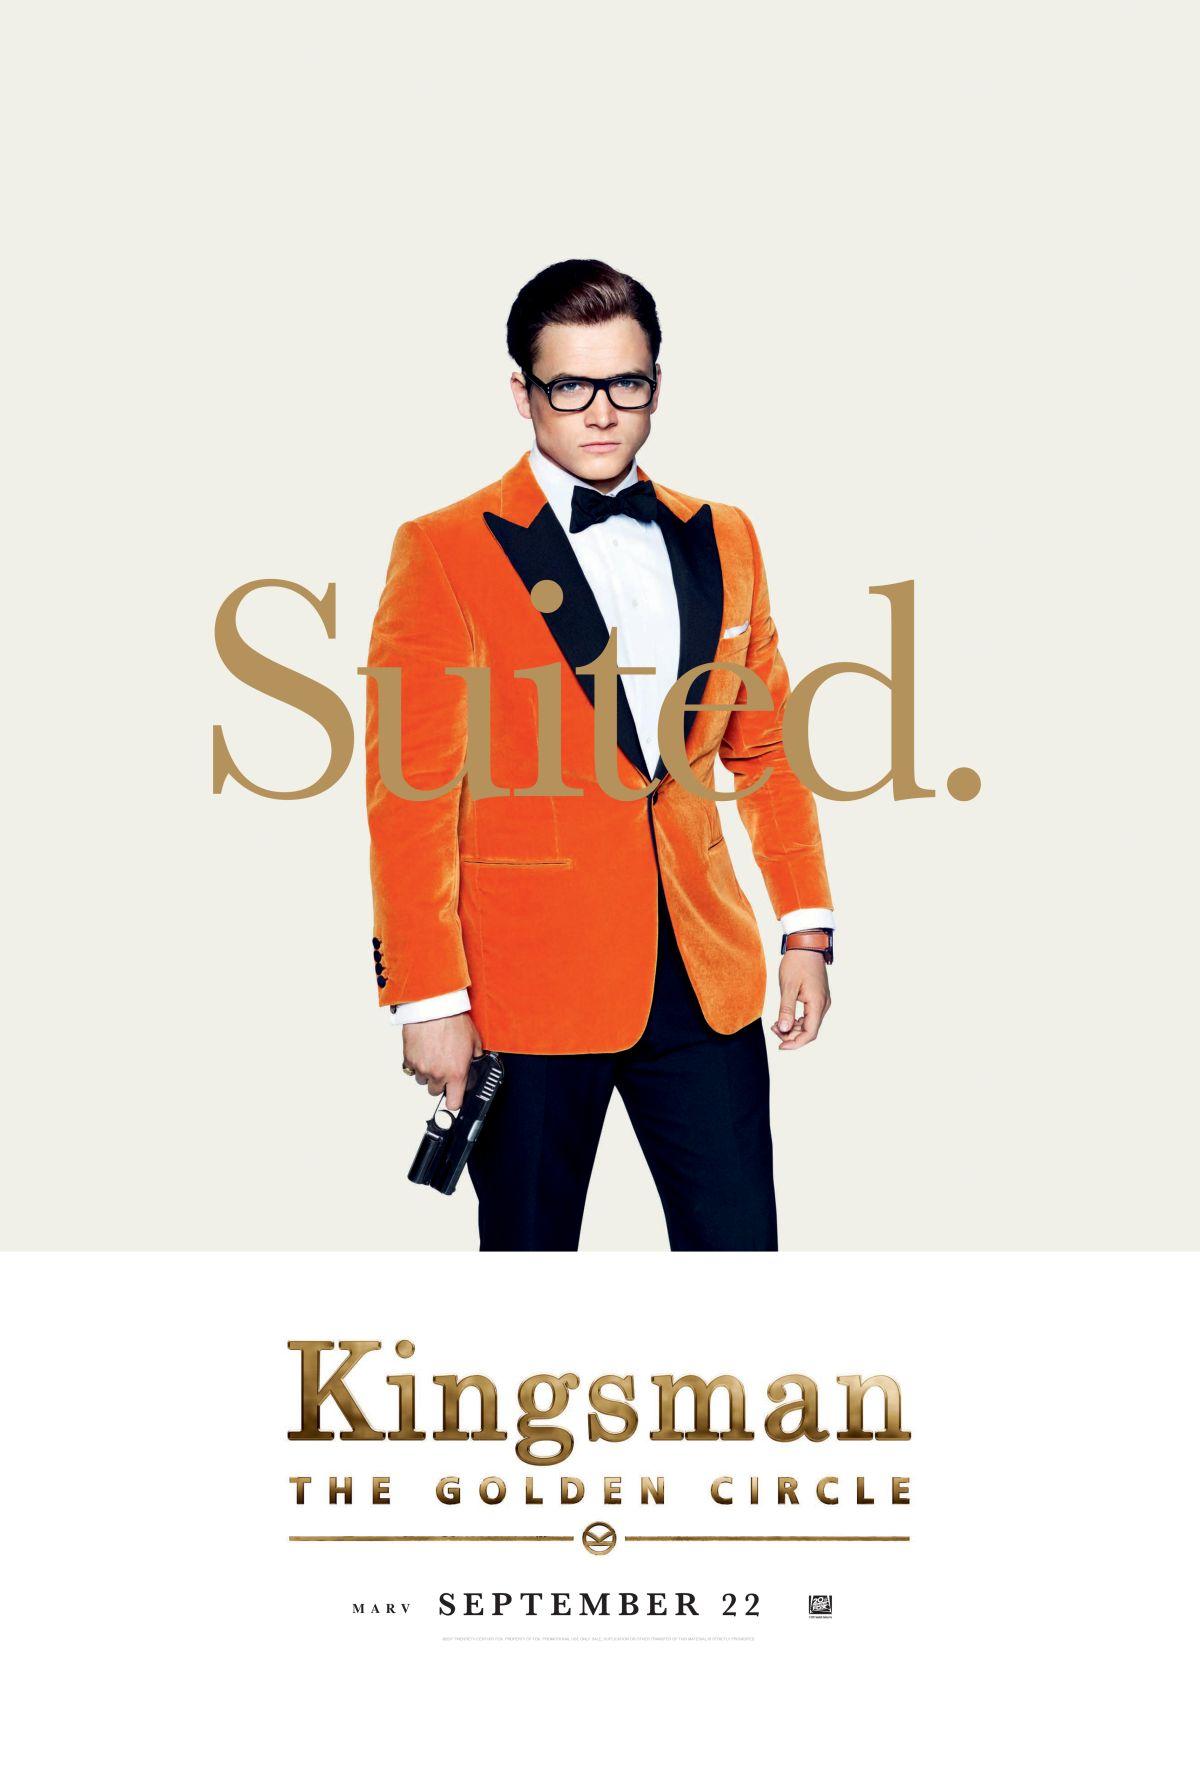 Kingsman: Il cerchio d'oro - Il character poster di Taron Egerton